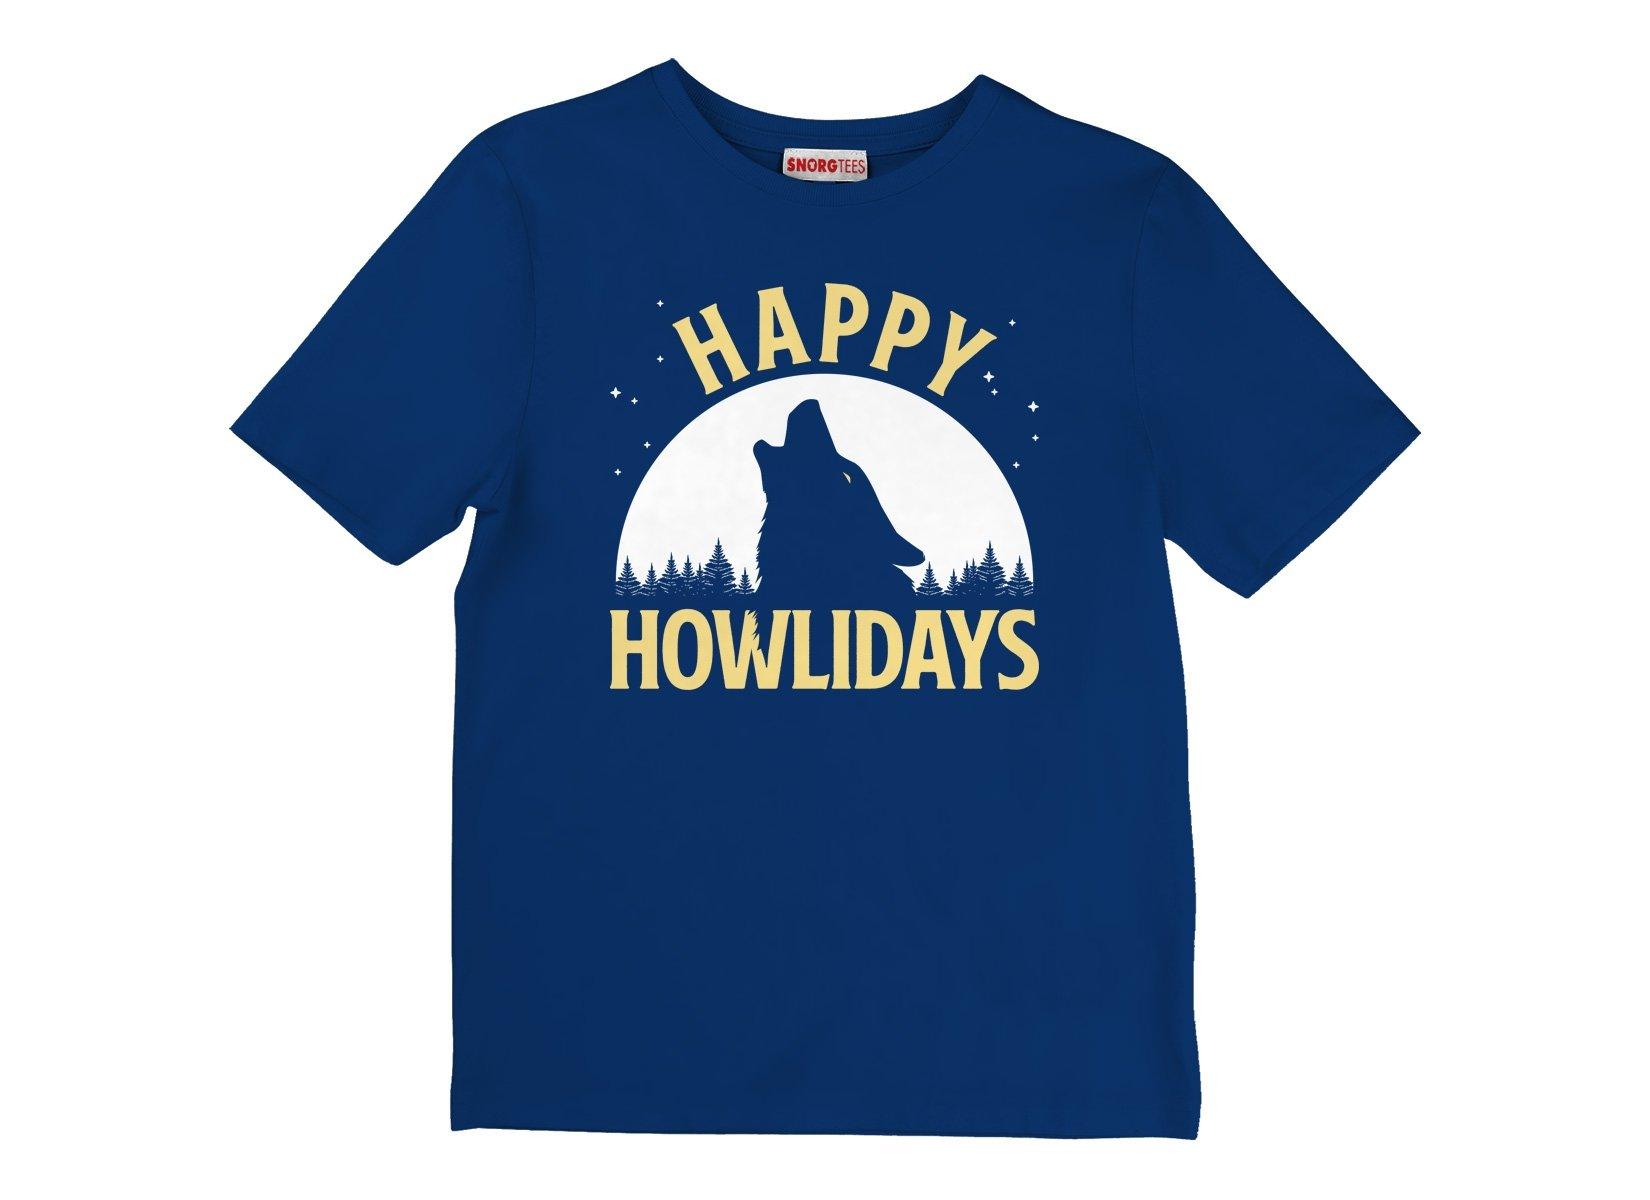 Happy Howlidays on Kids T-Shirt